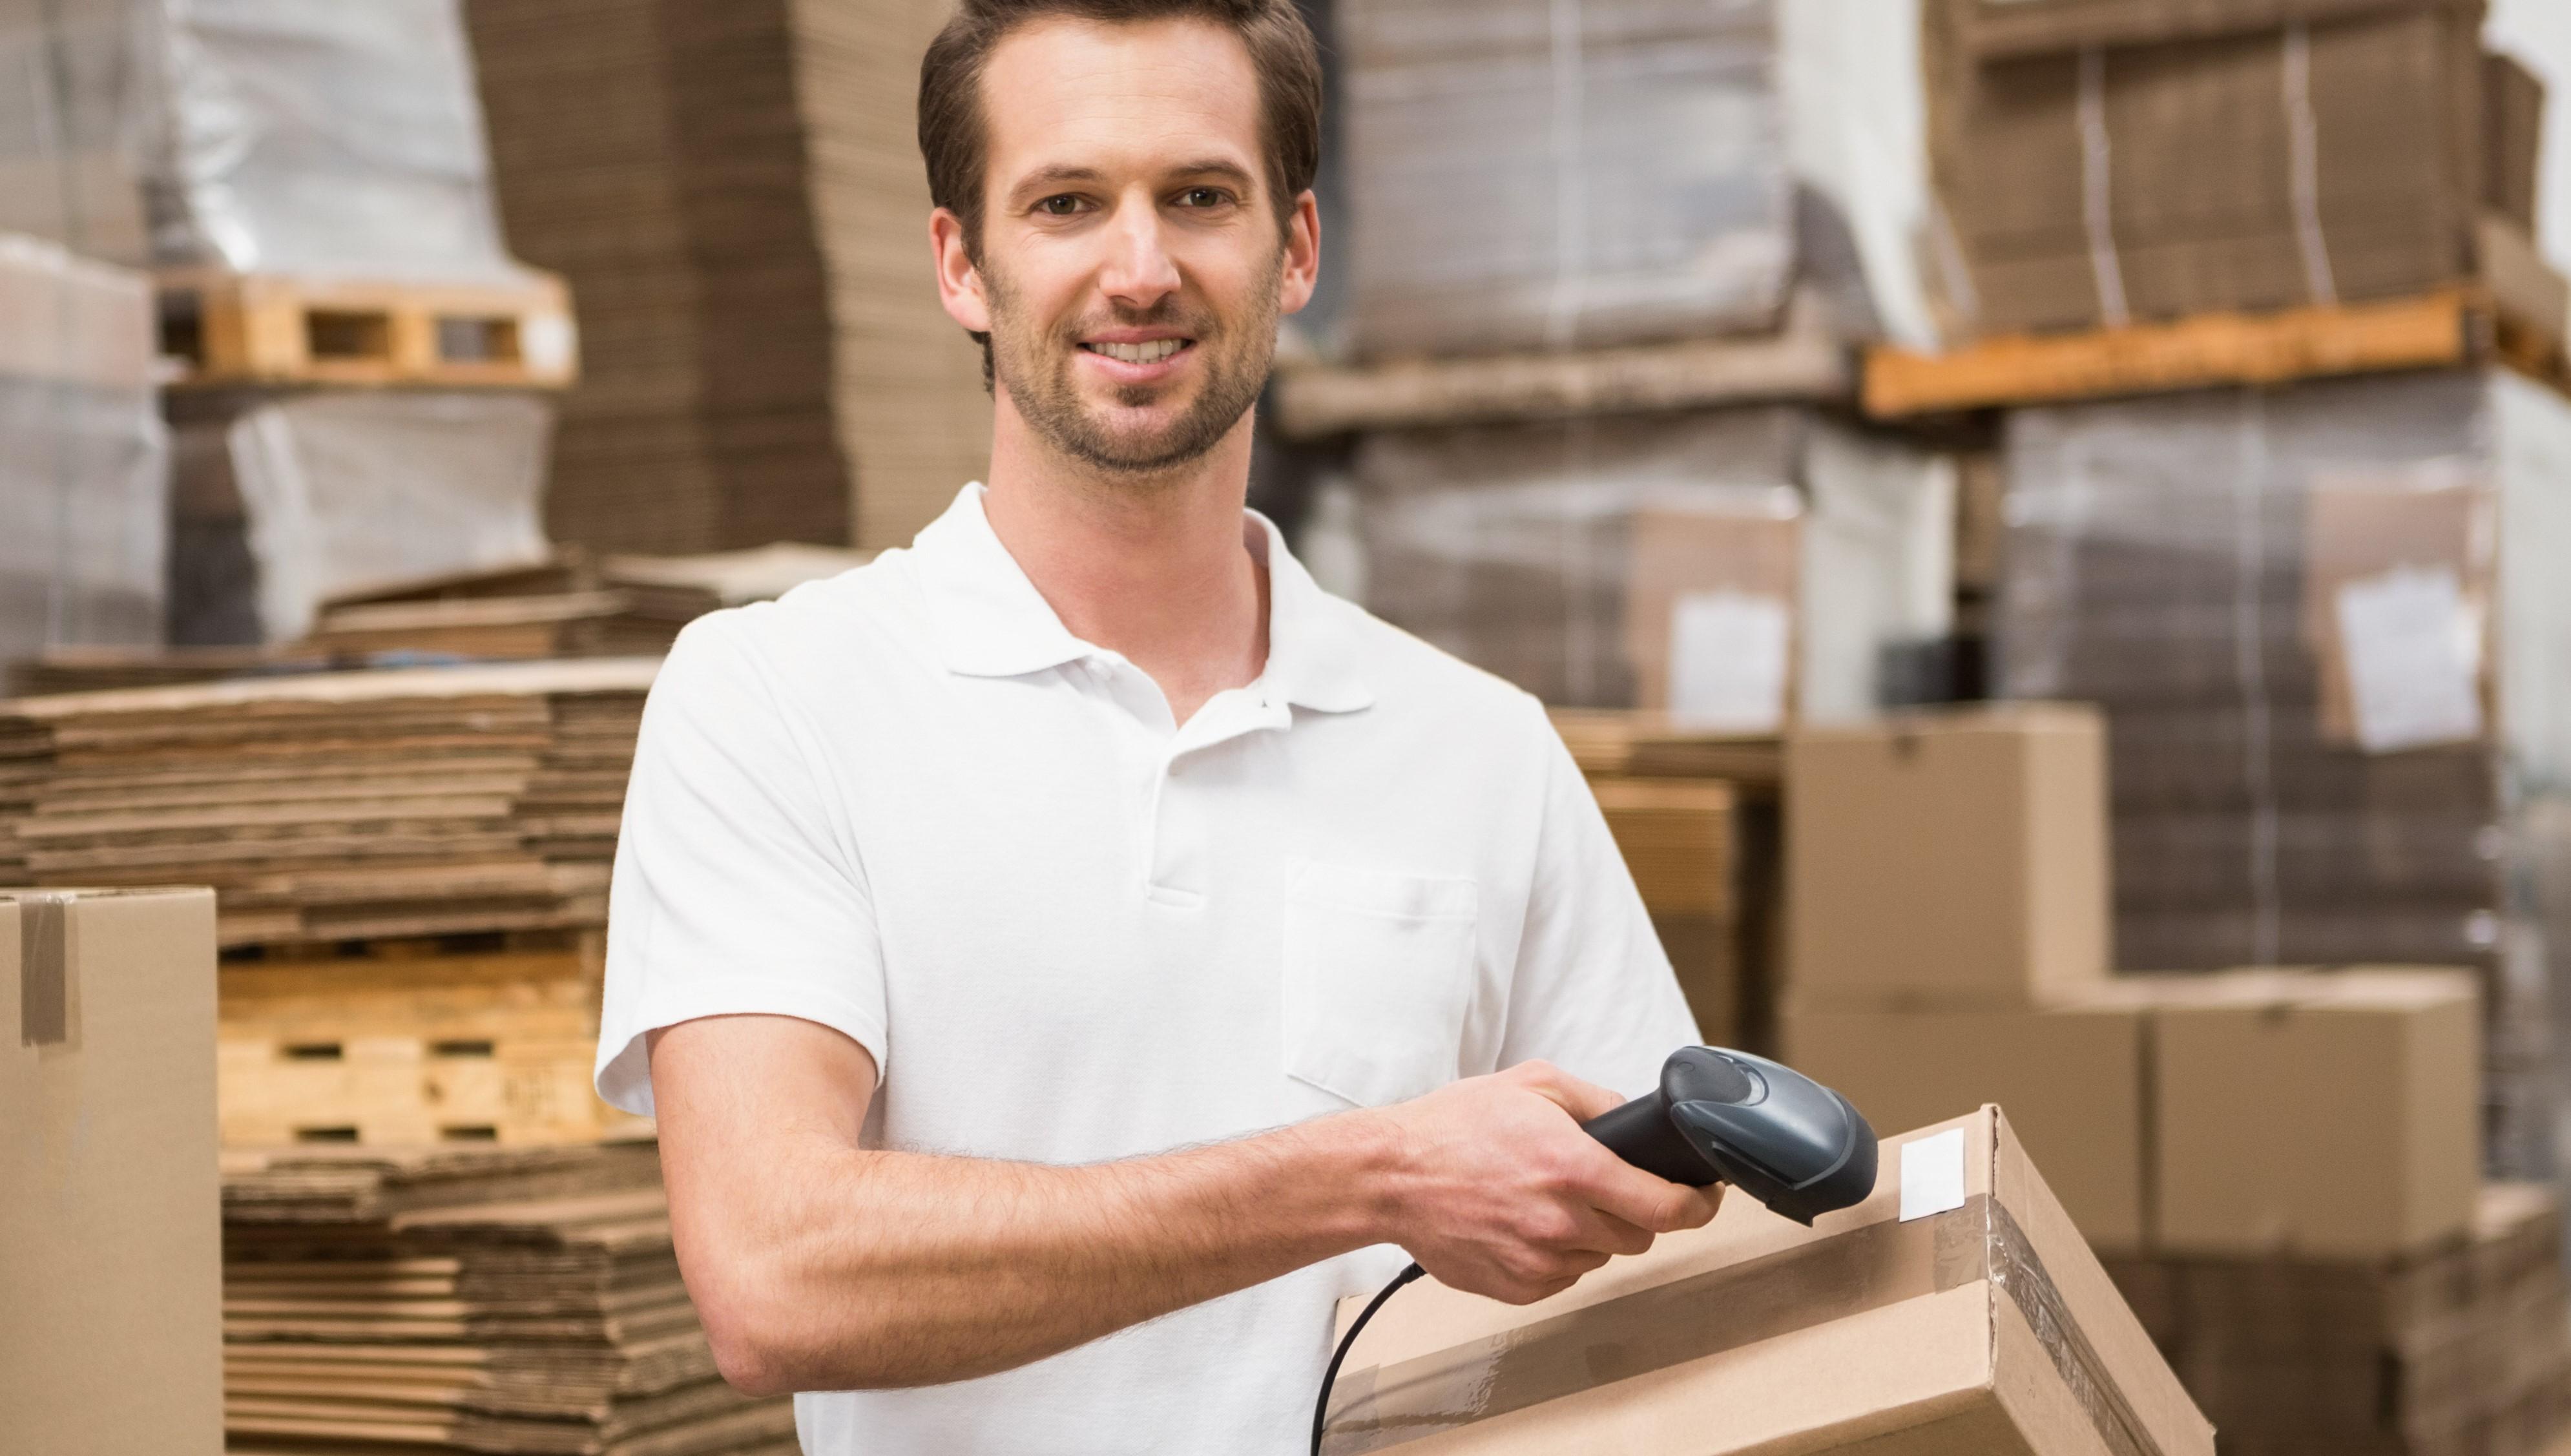 Warehouse worker (Germany) - German or Polish language